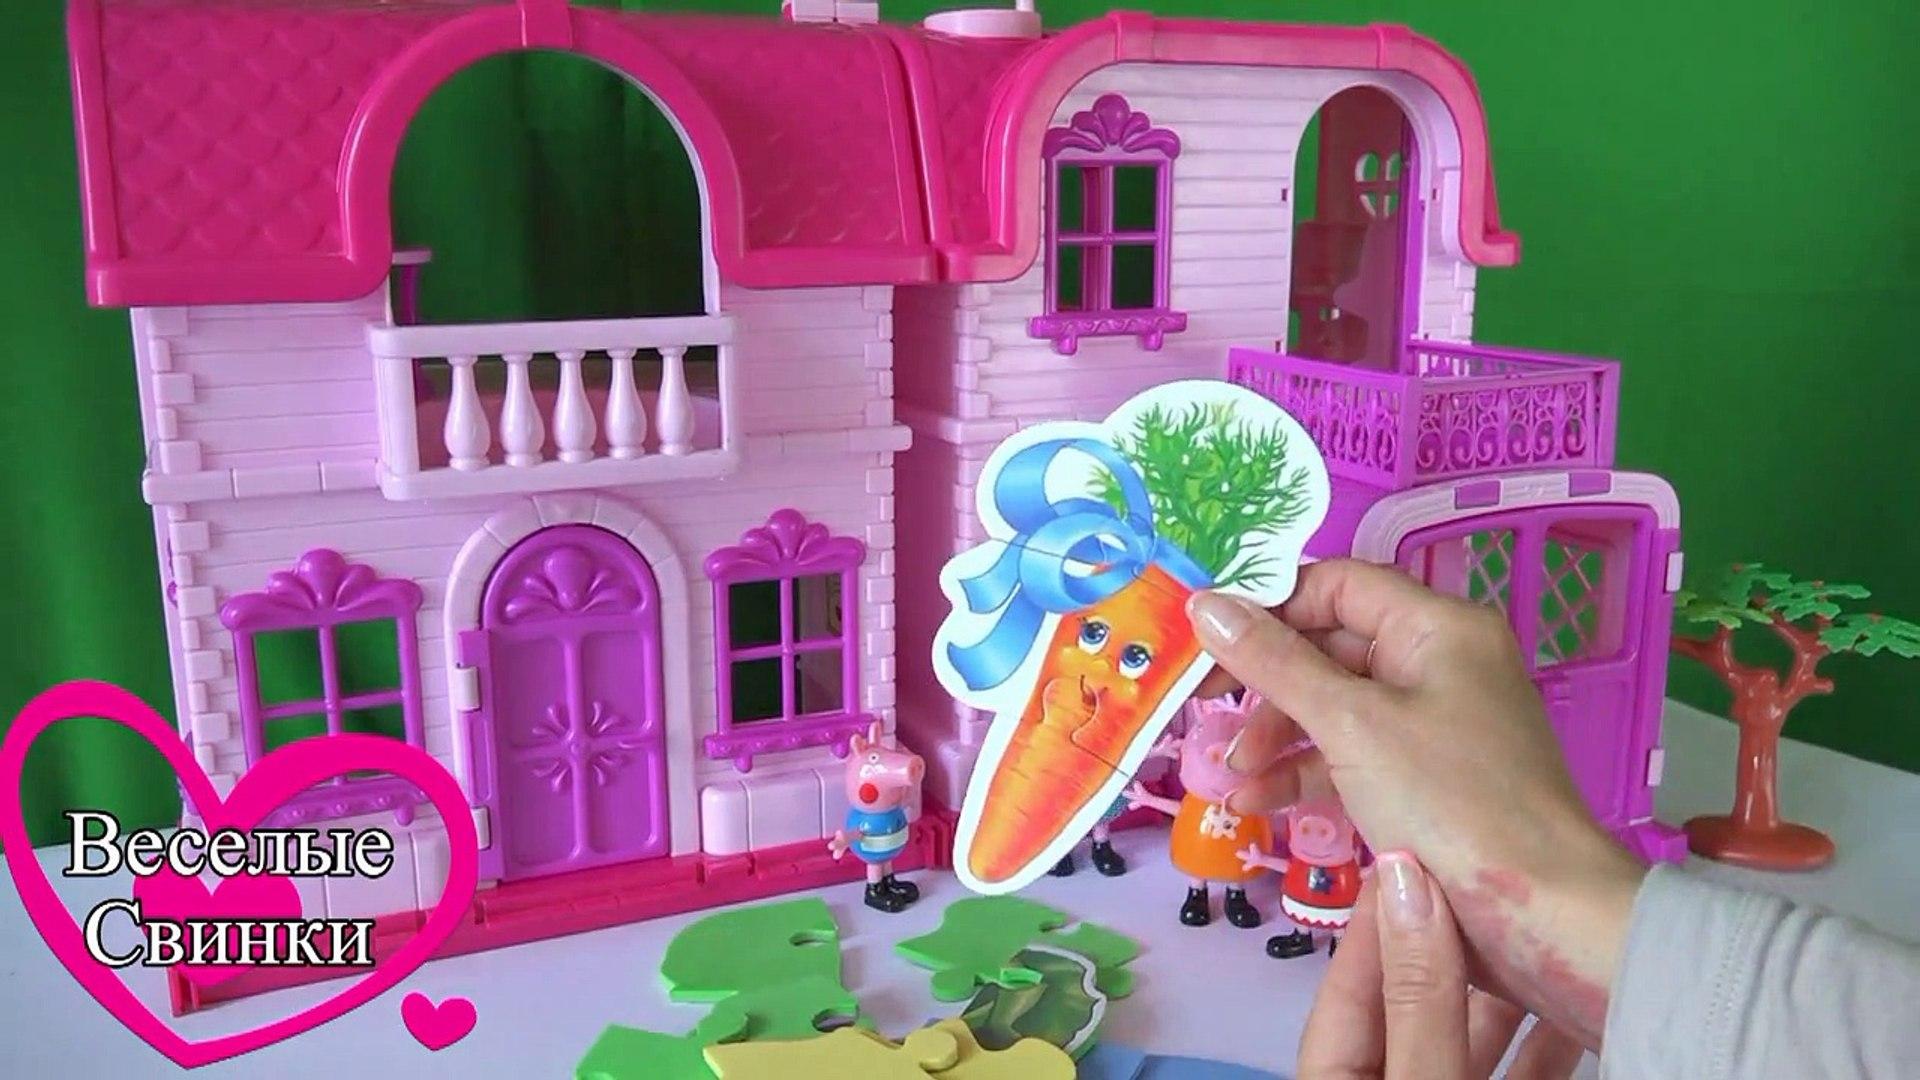 Свинка Пеппа Пазл Овощи мультик из игрушек Peppa Pig Puzzle Vegetables